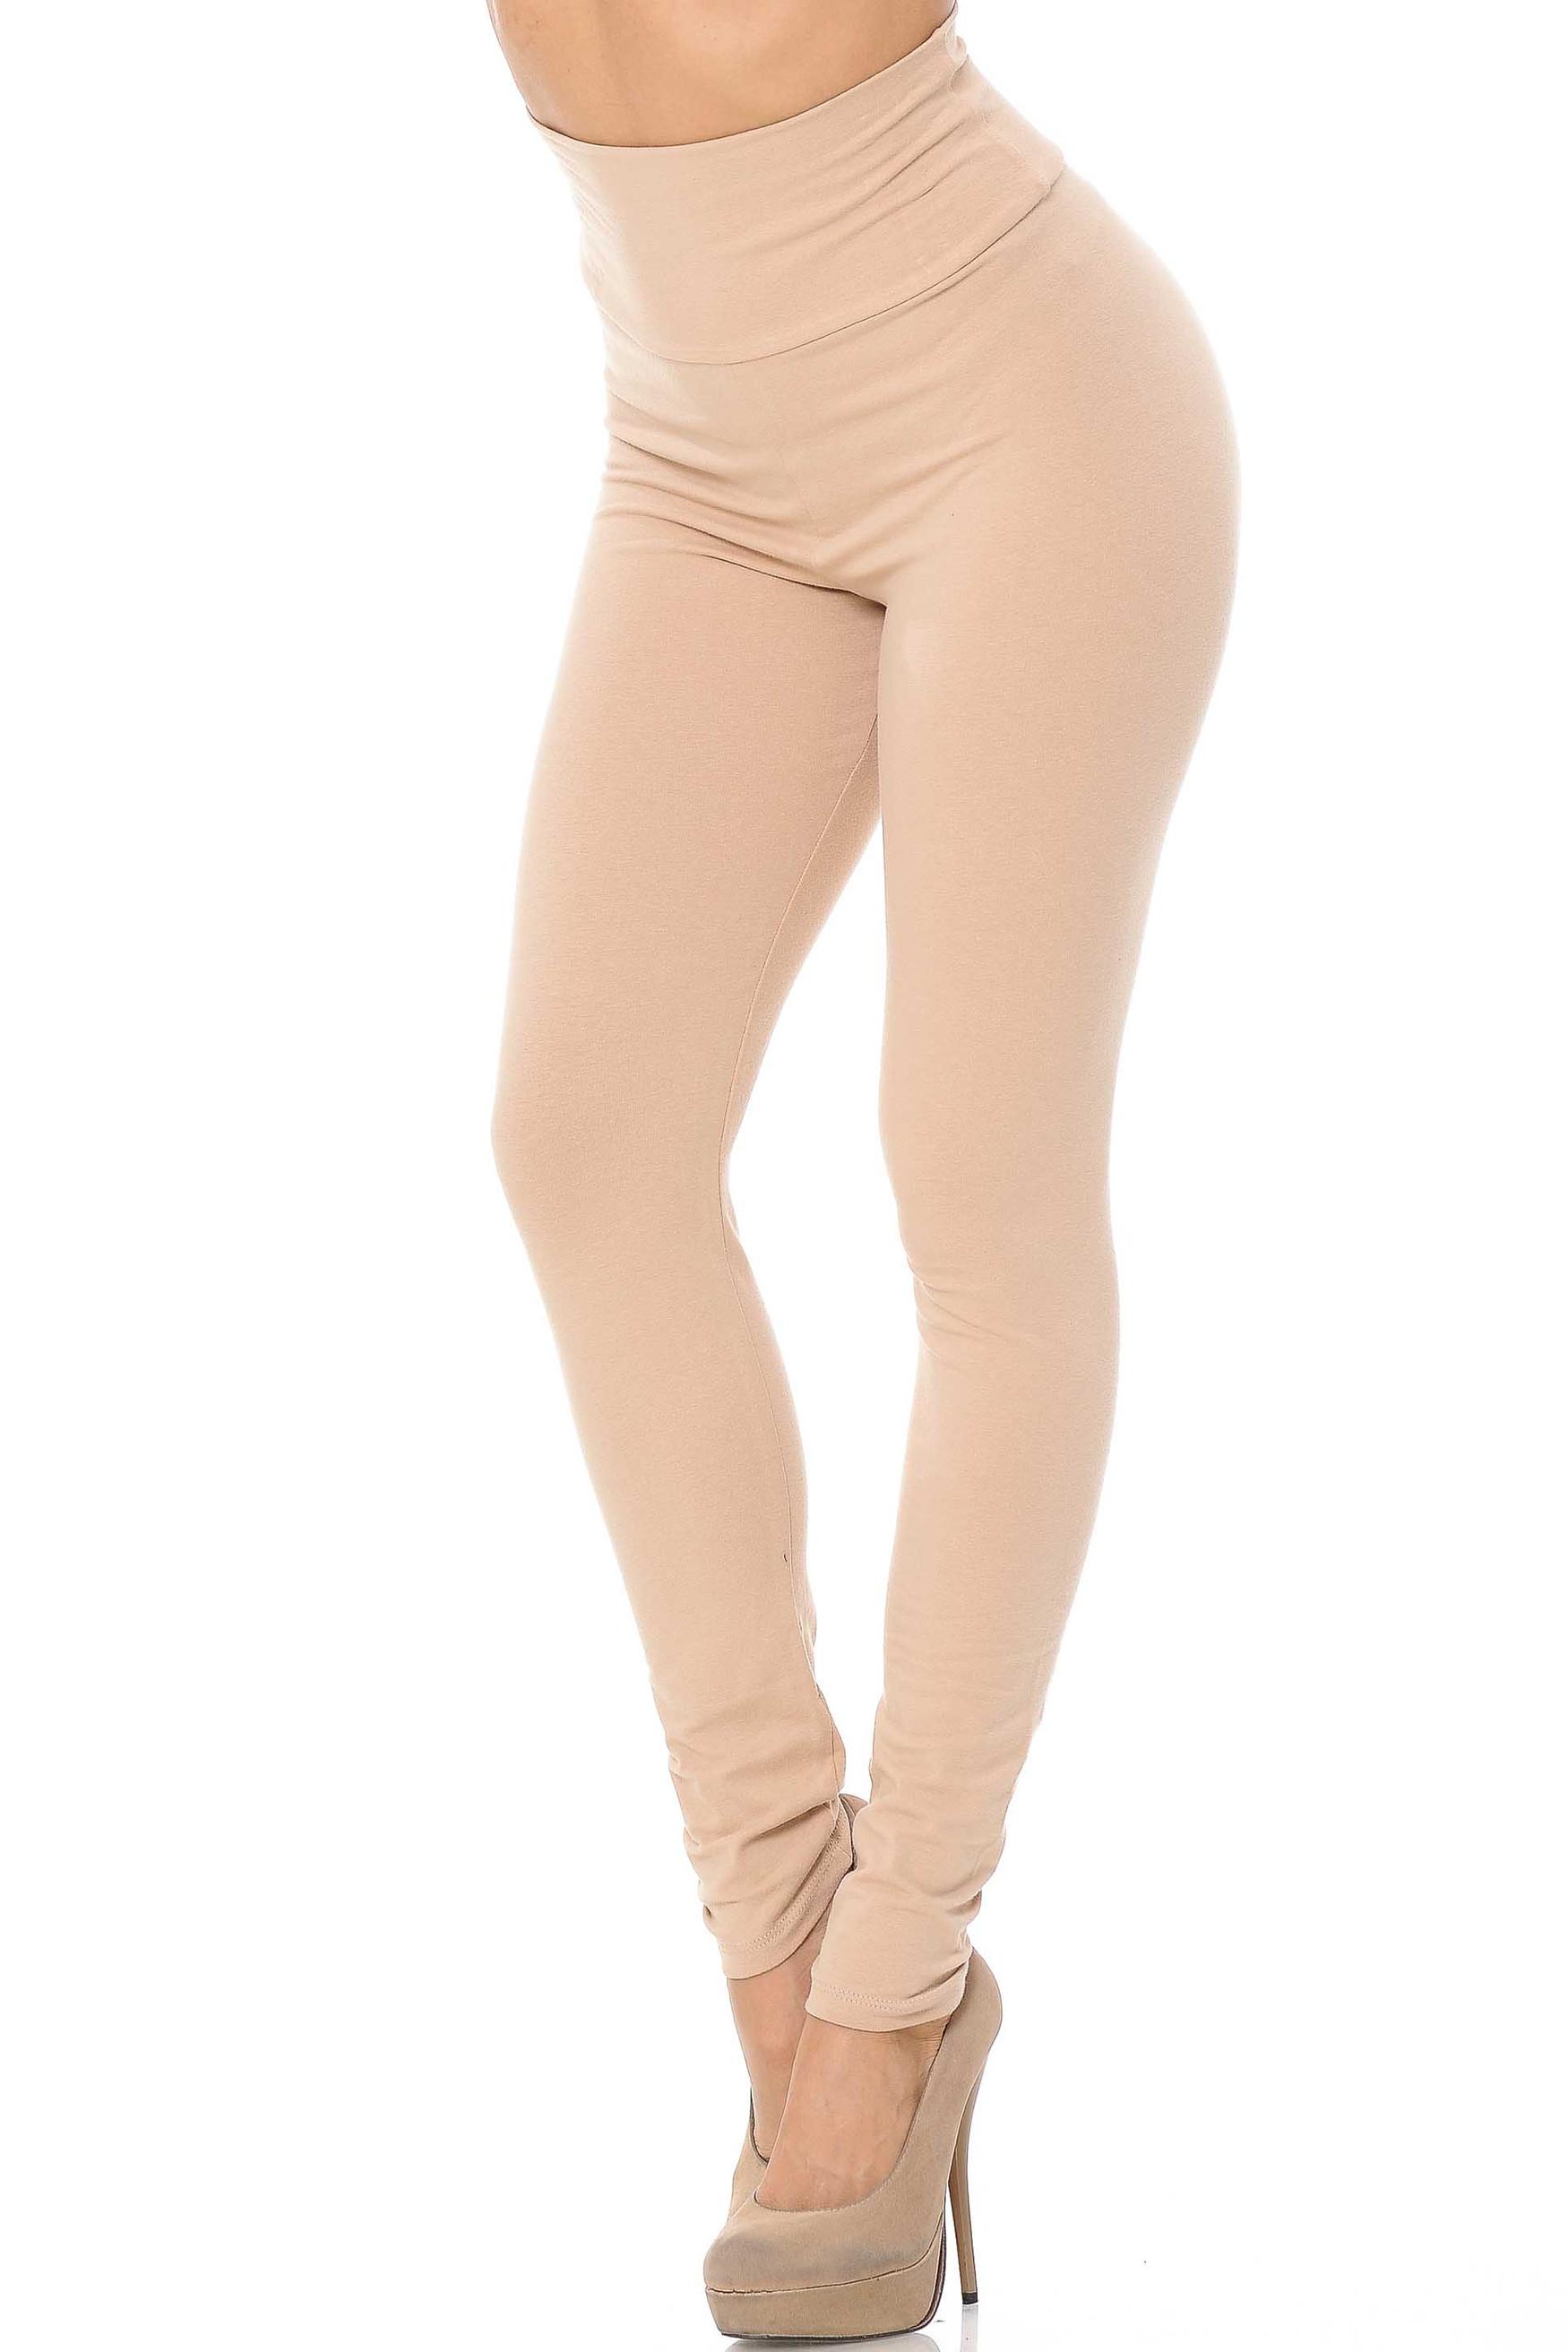 Beige USA High Waisted Cotton Leggings